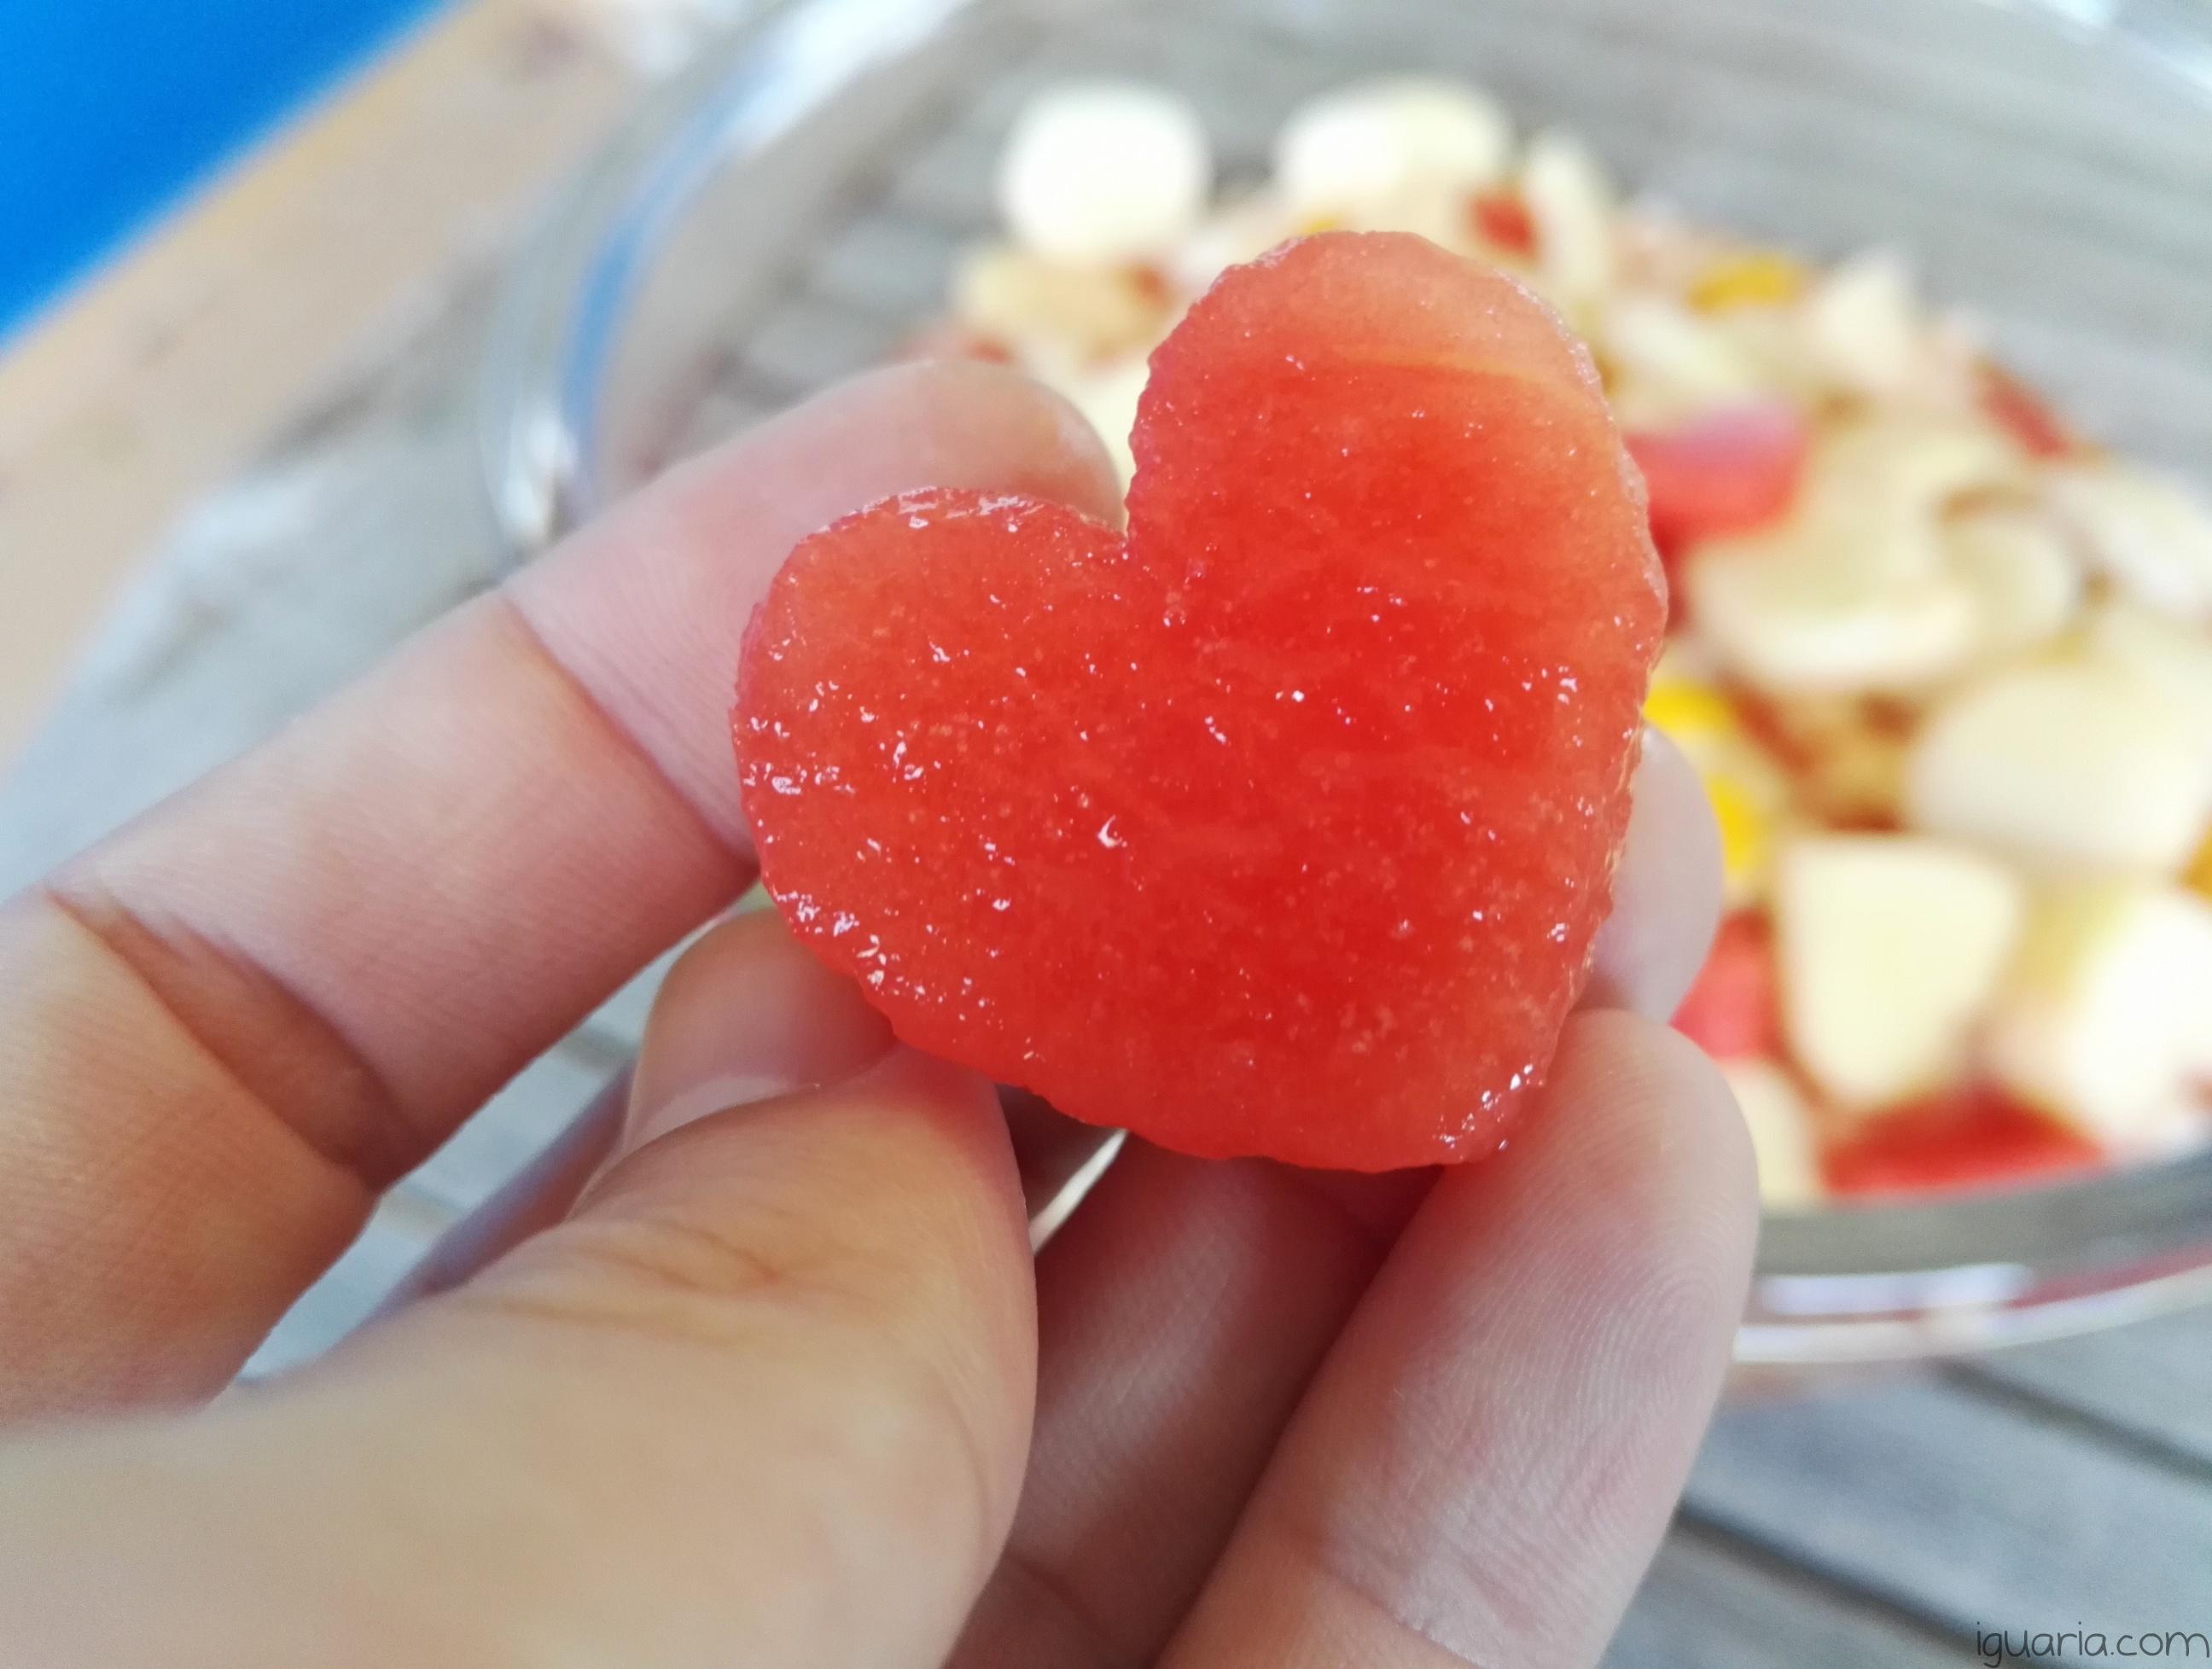 iguaria-salada-fruta-coracao